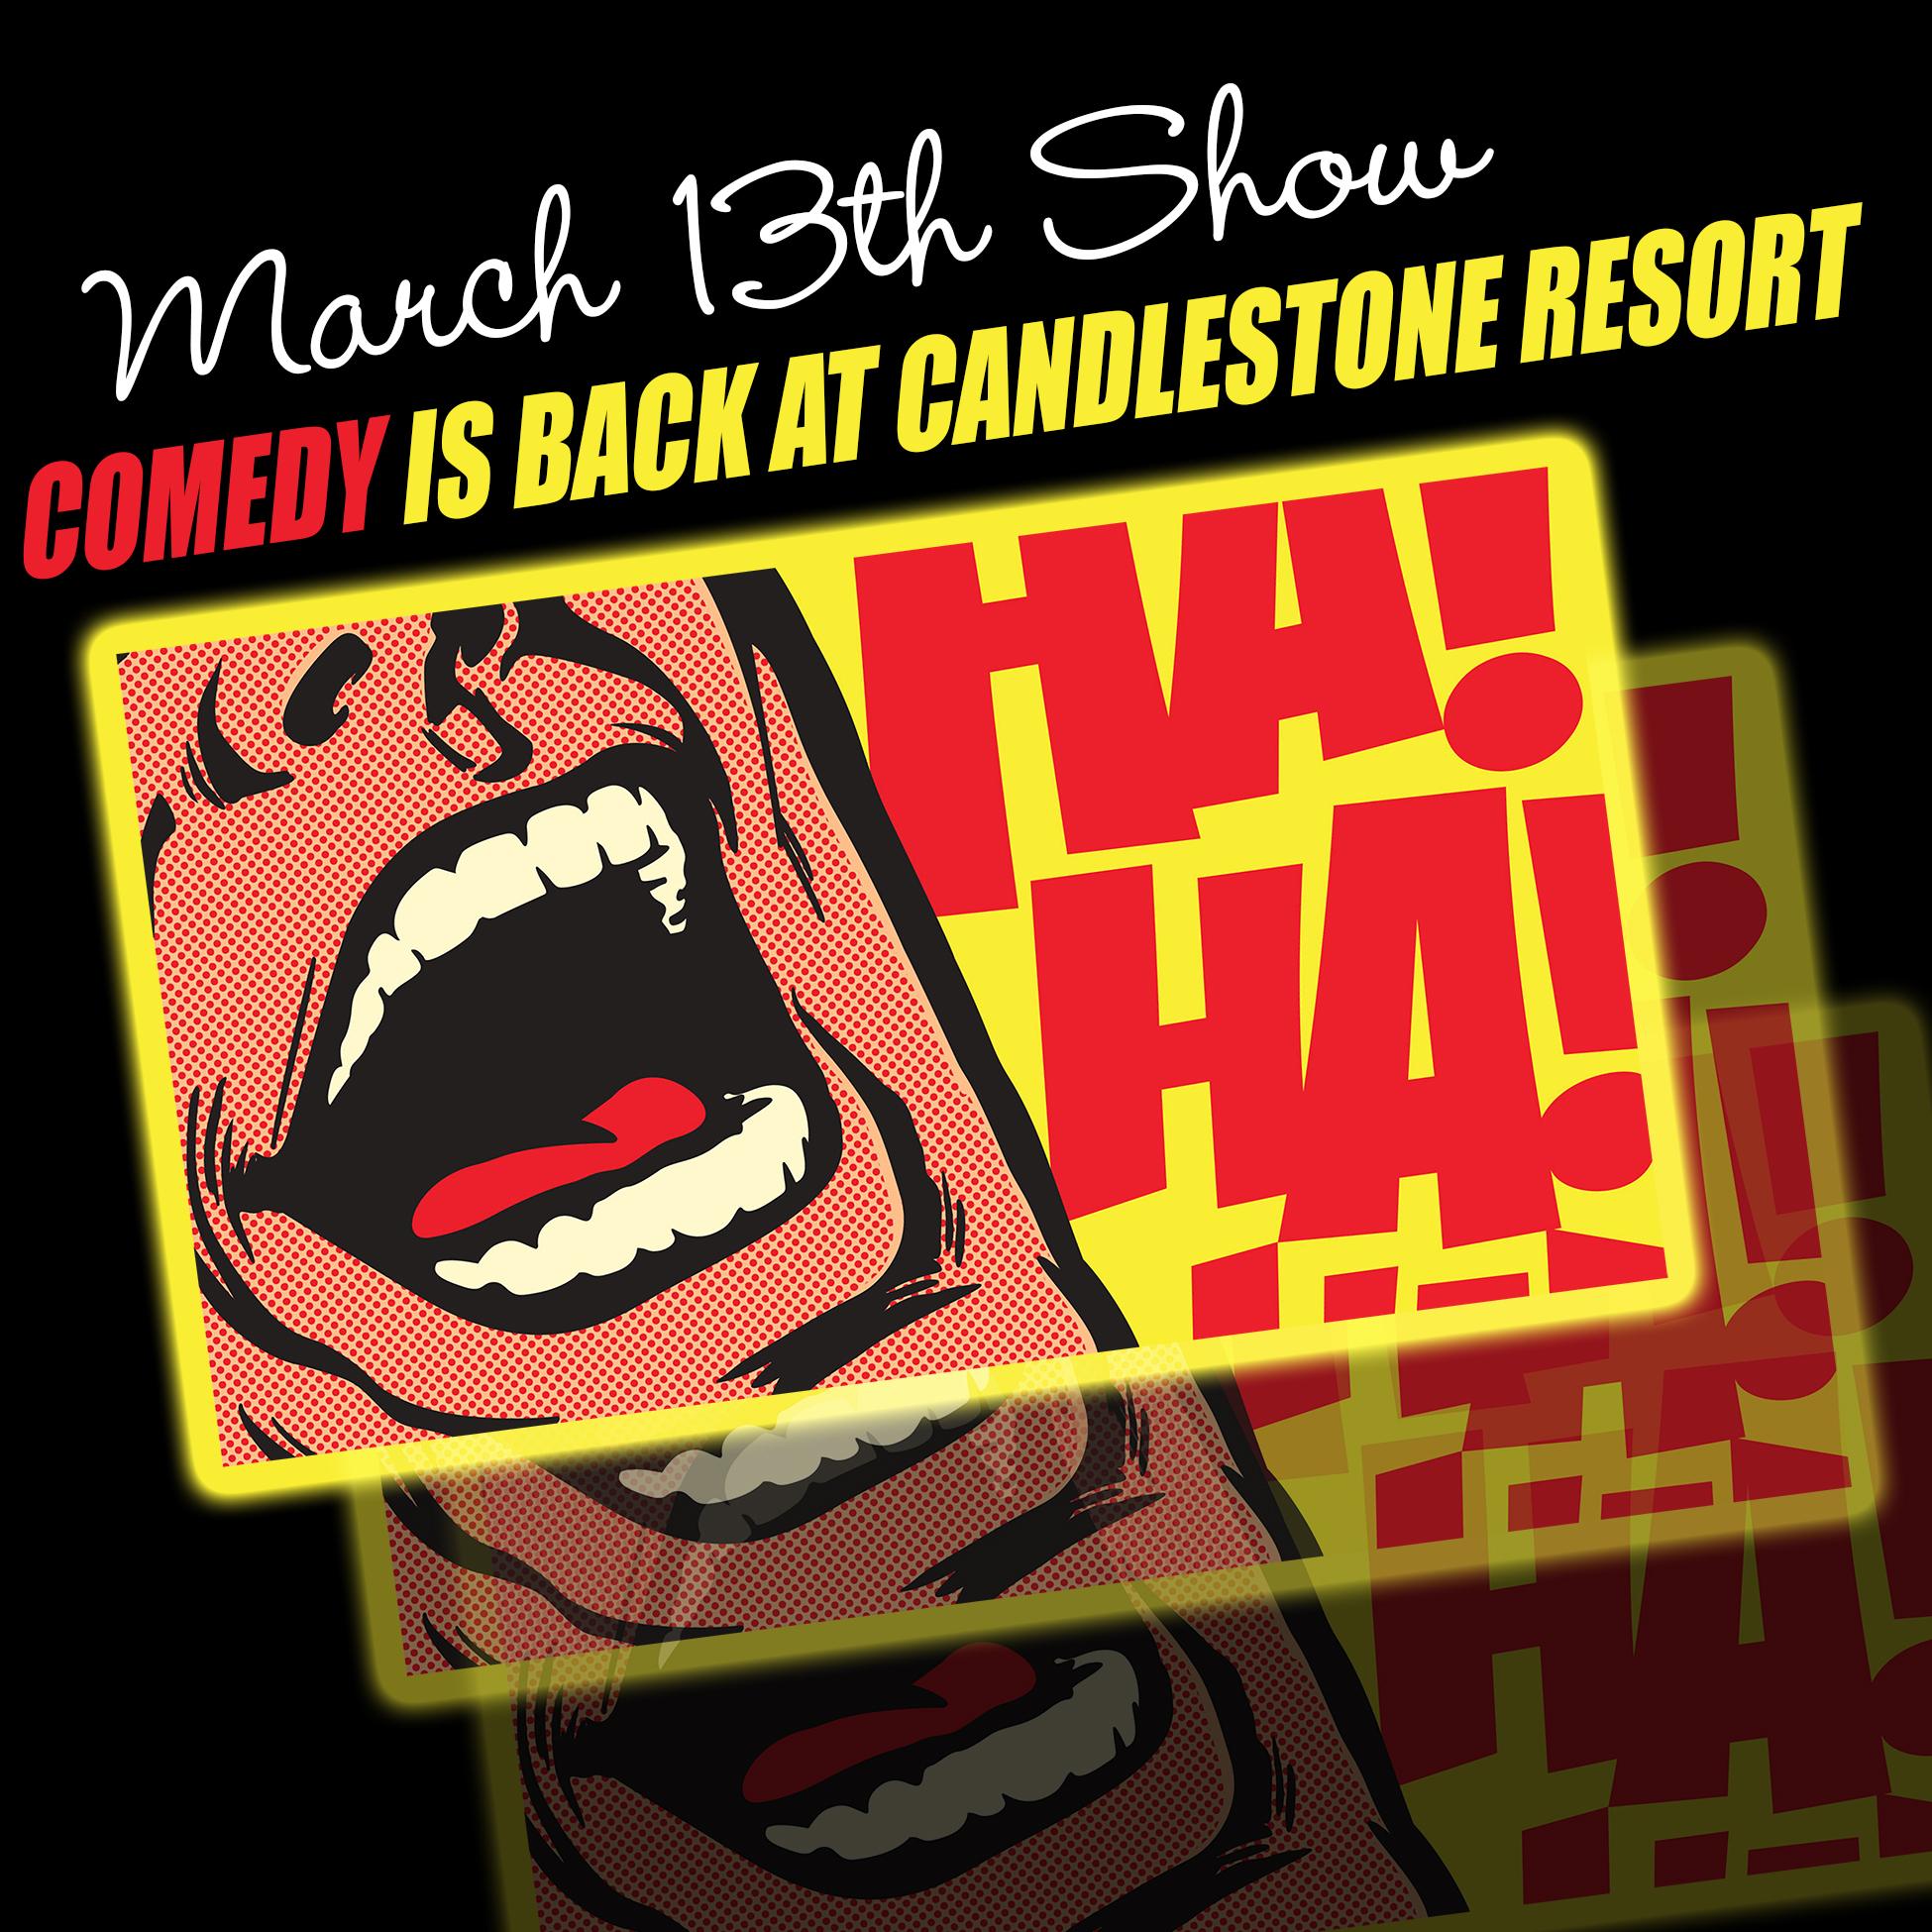 March 13th Comedy Show 2020-Comedy-Mar13th